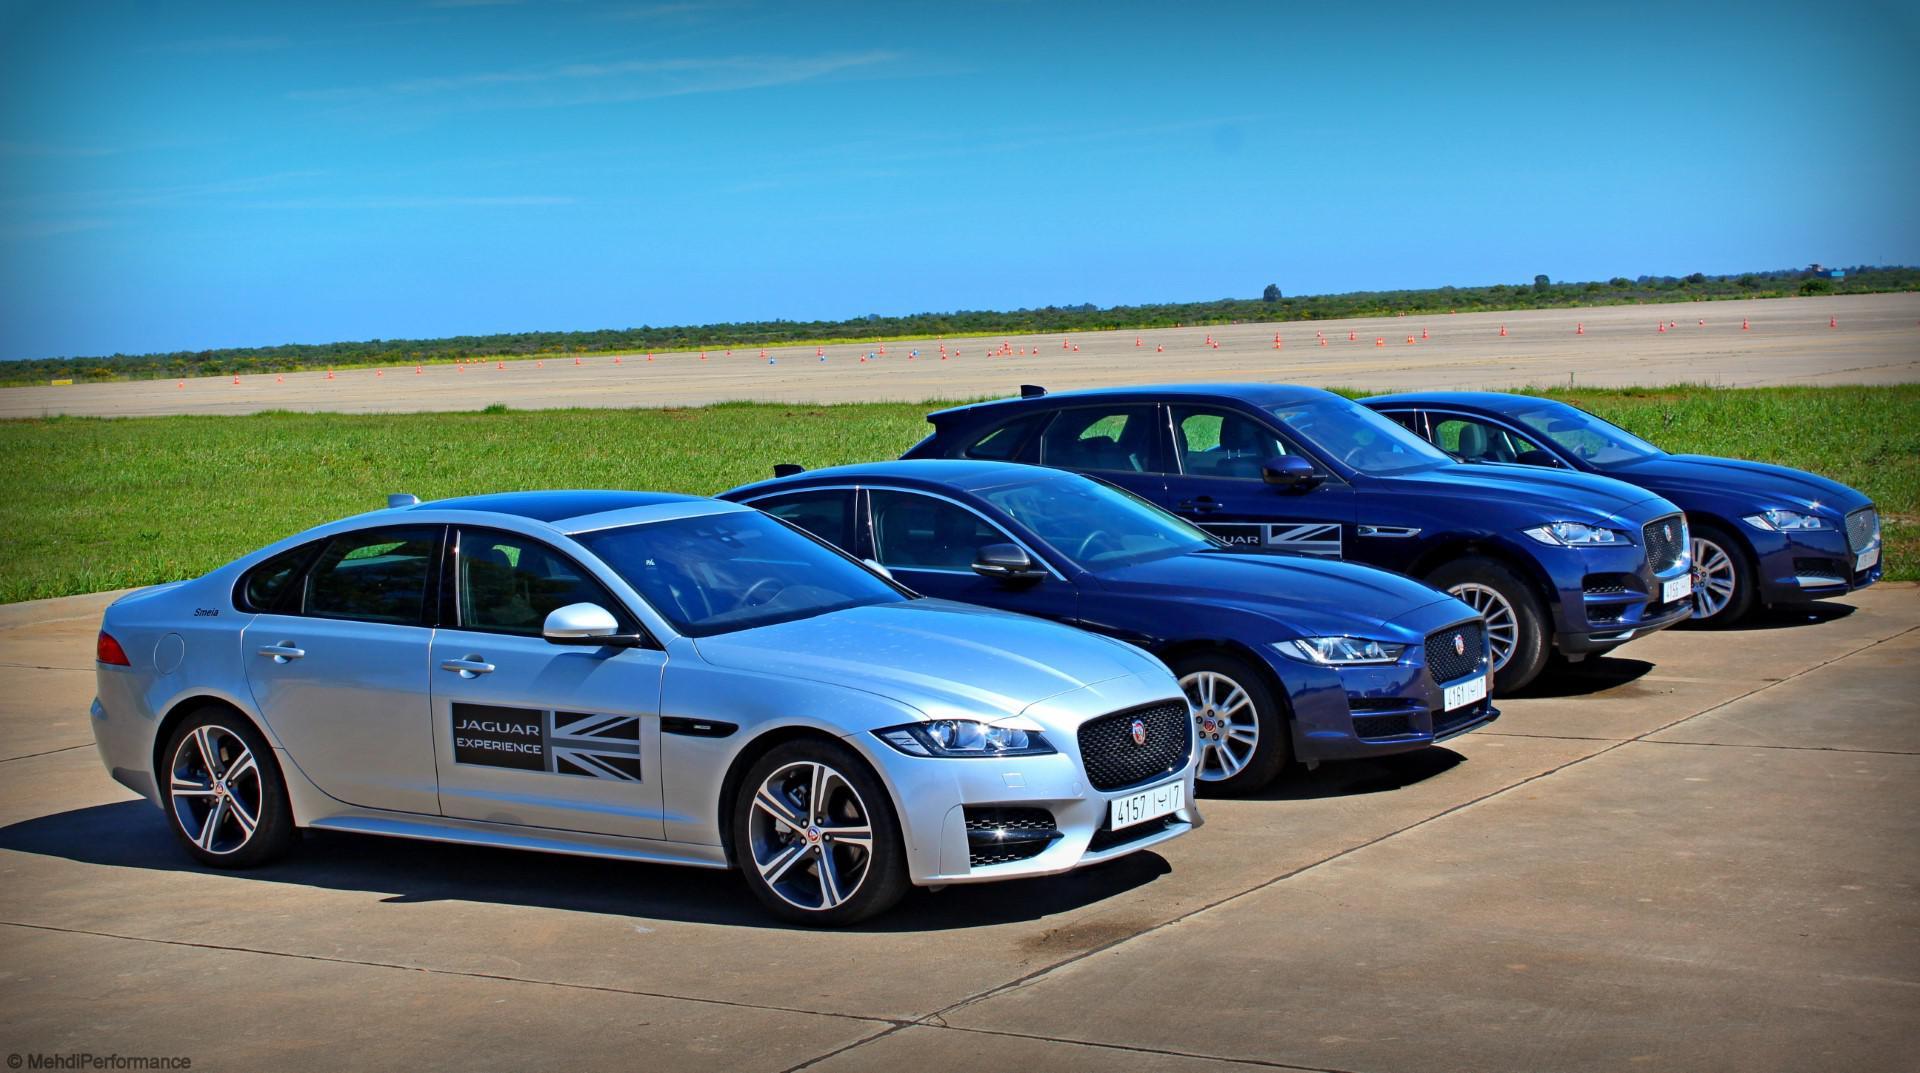 jaguar-amp-land-rover-experience-734-6.jpg